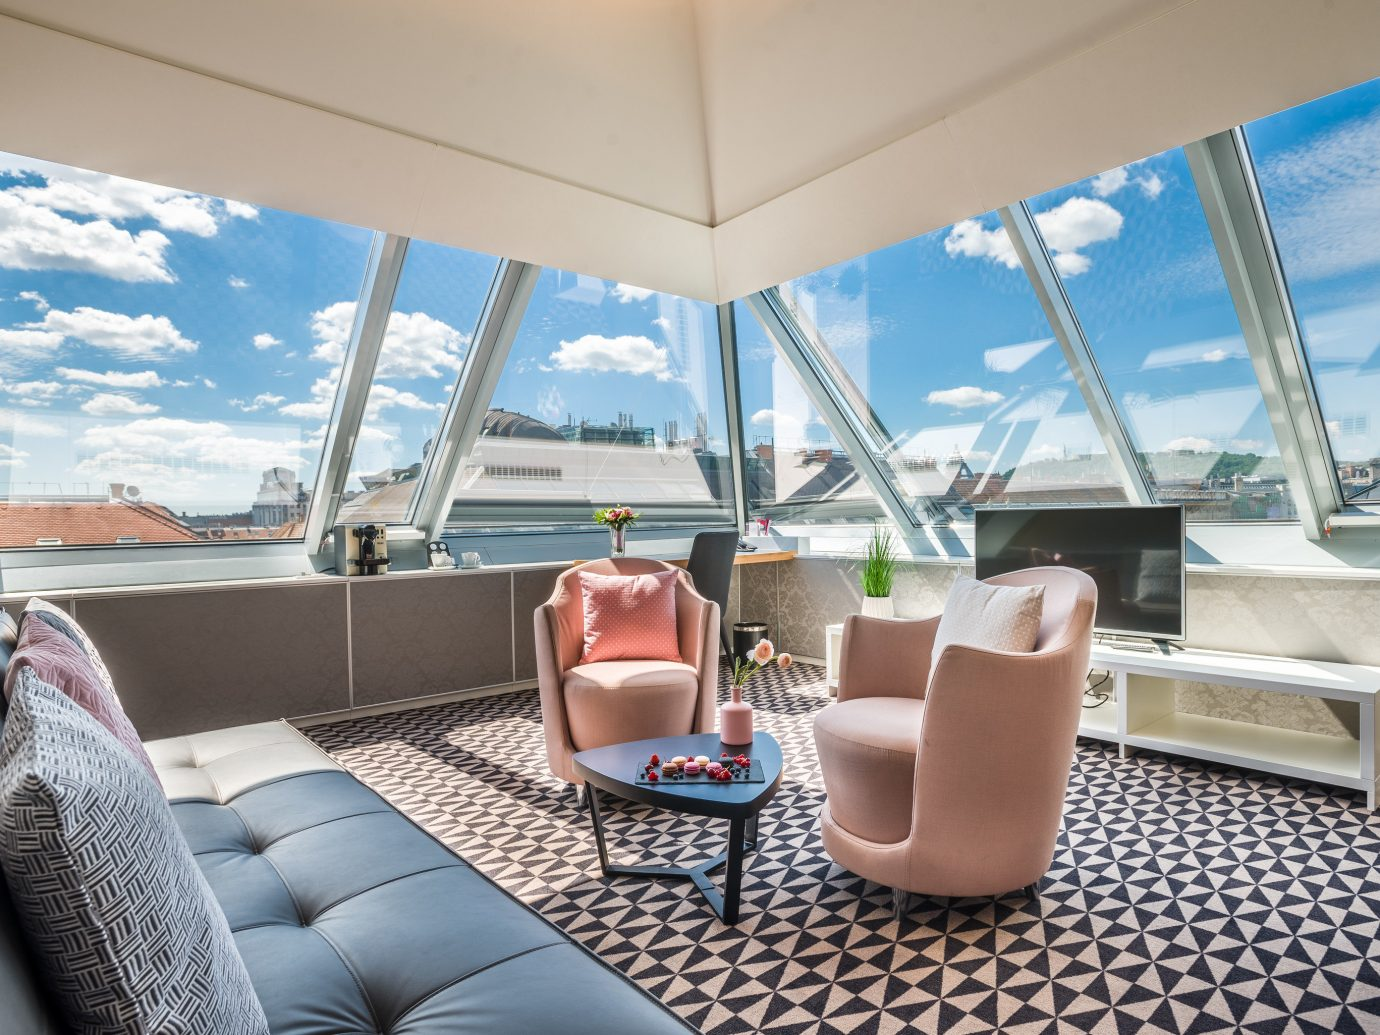 Trip Ideas window Boat indoor chair passenger ship room vehicle property ship yacht luxury yacht watercraft interior design estate living room furniture